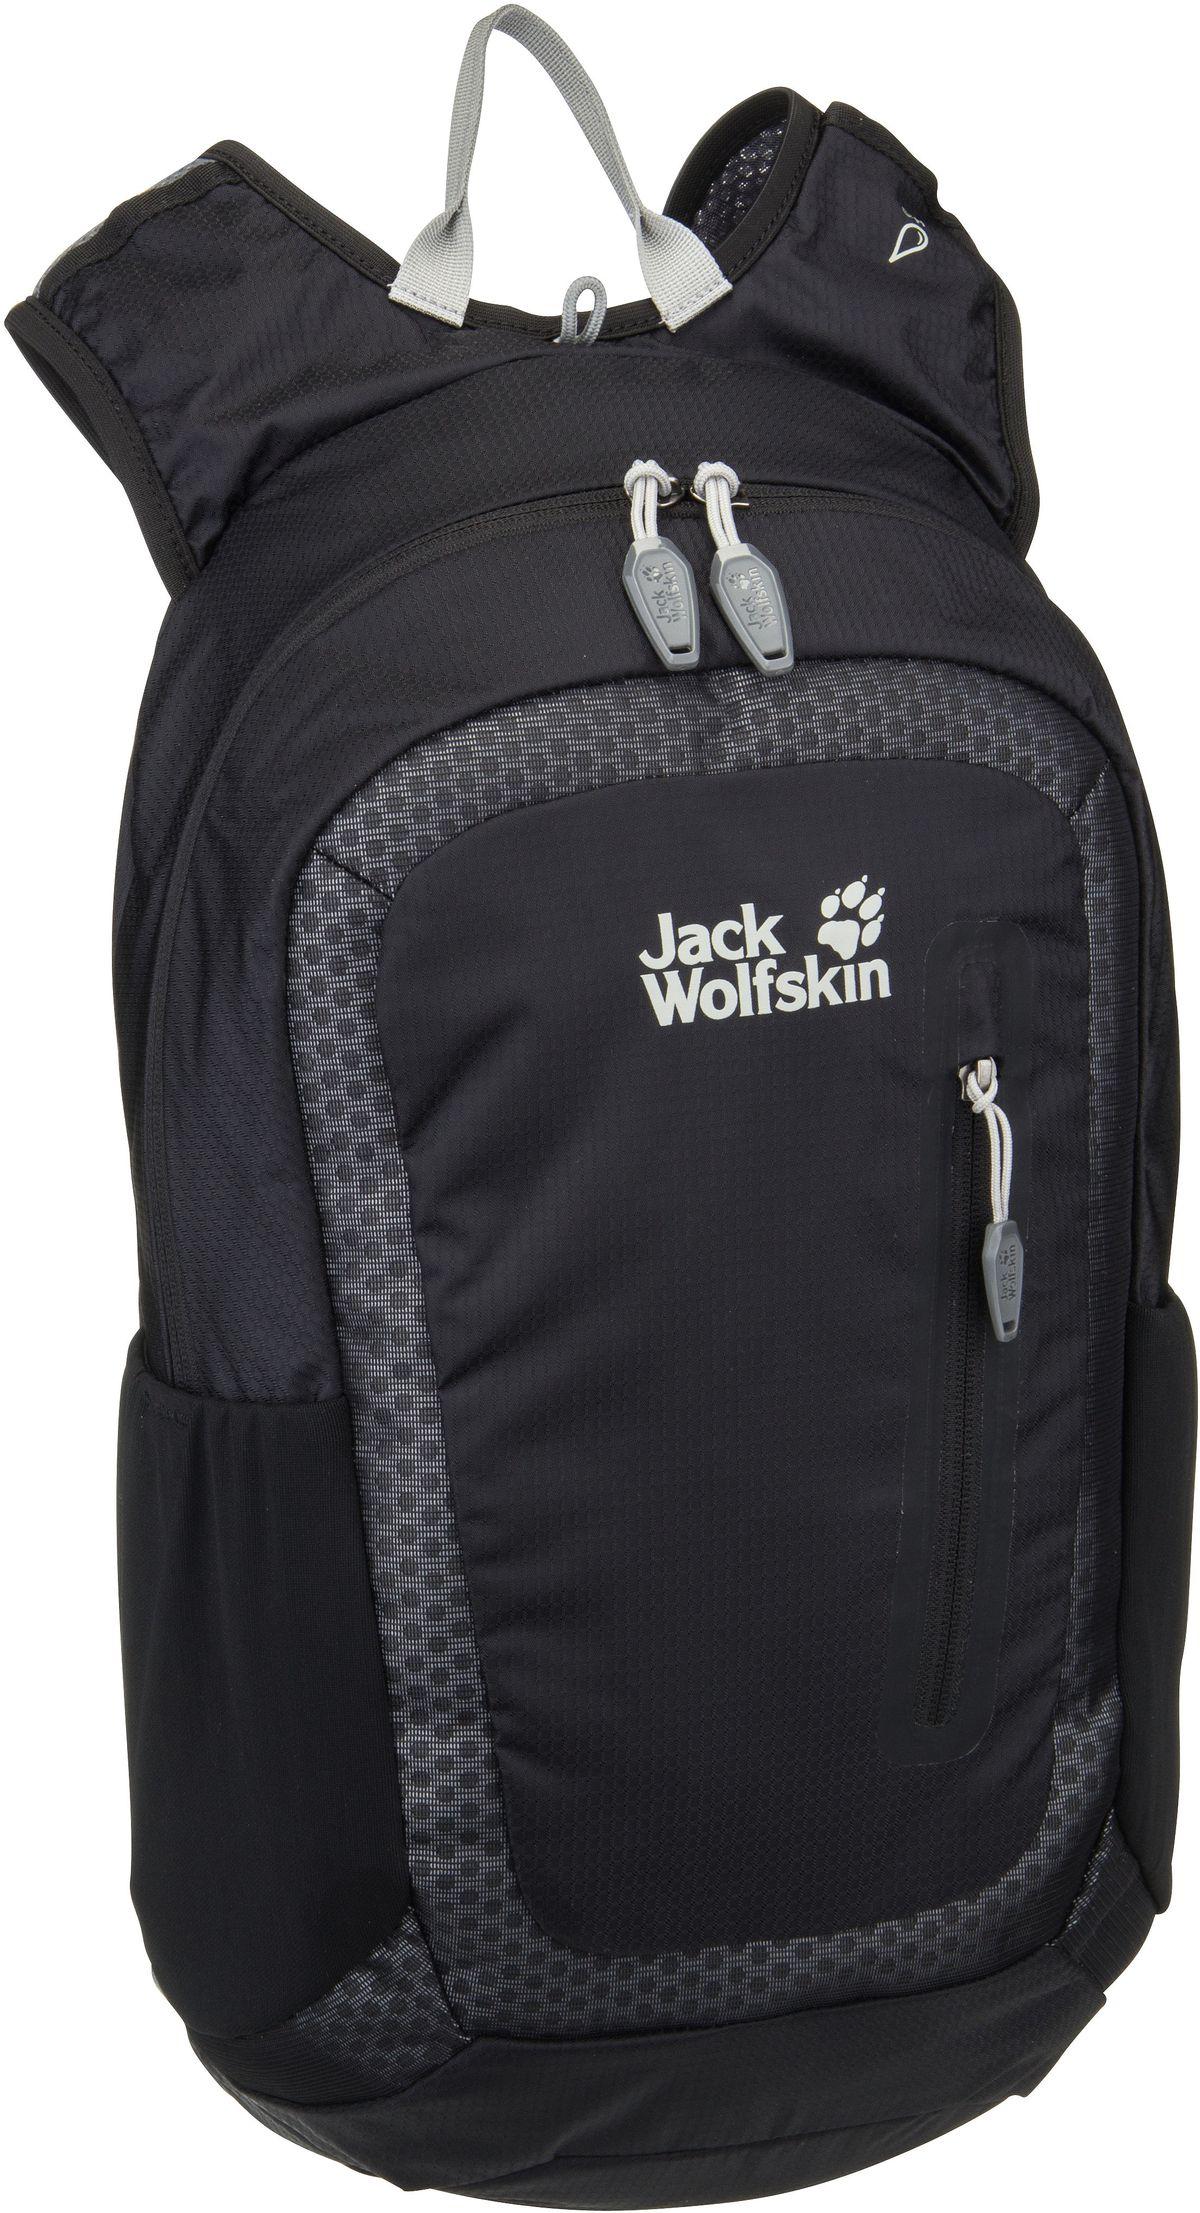 Rucksack / Daypack Proton 18 Pack Black